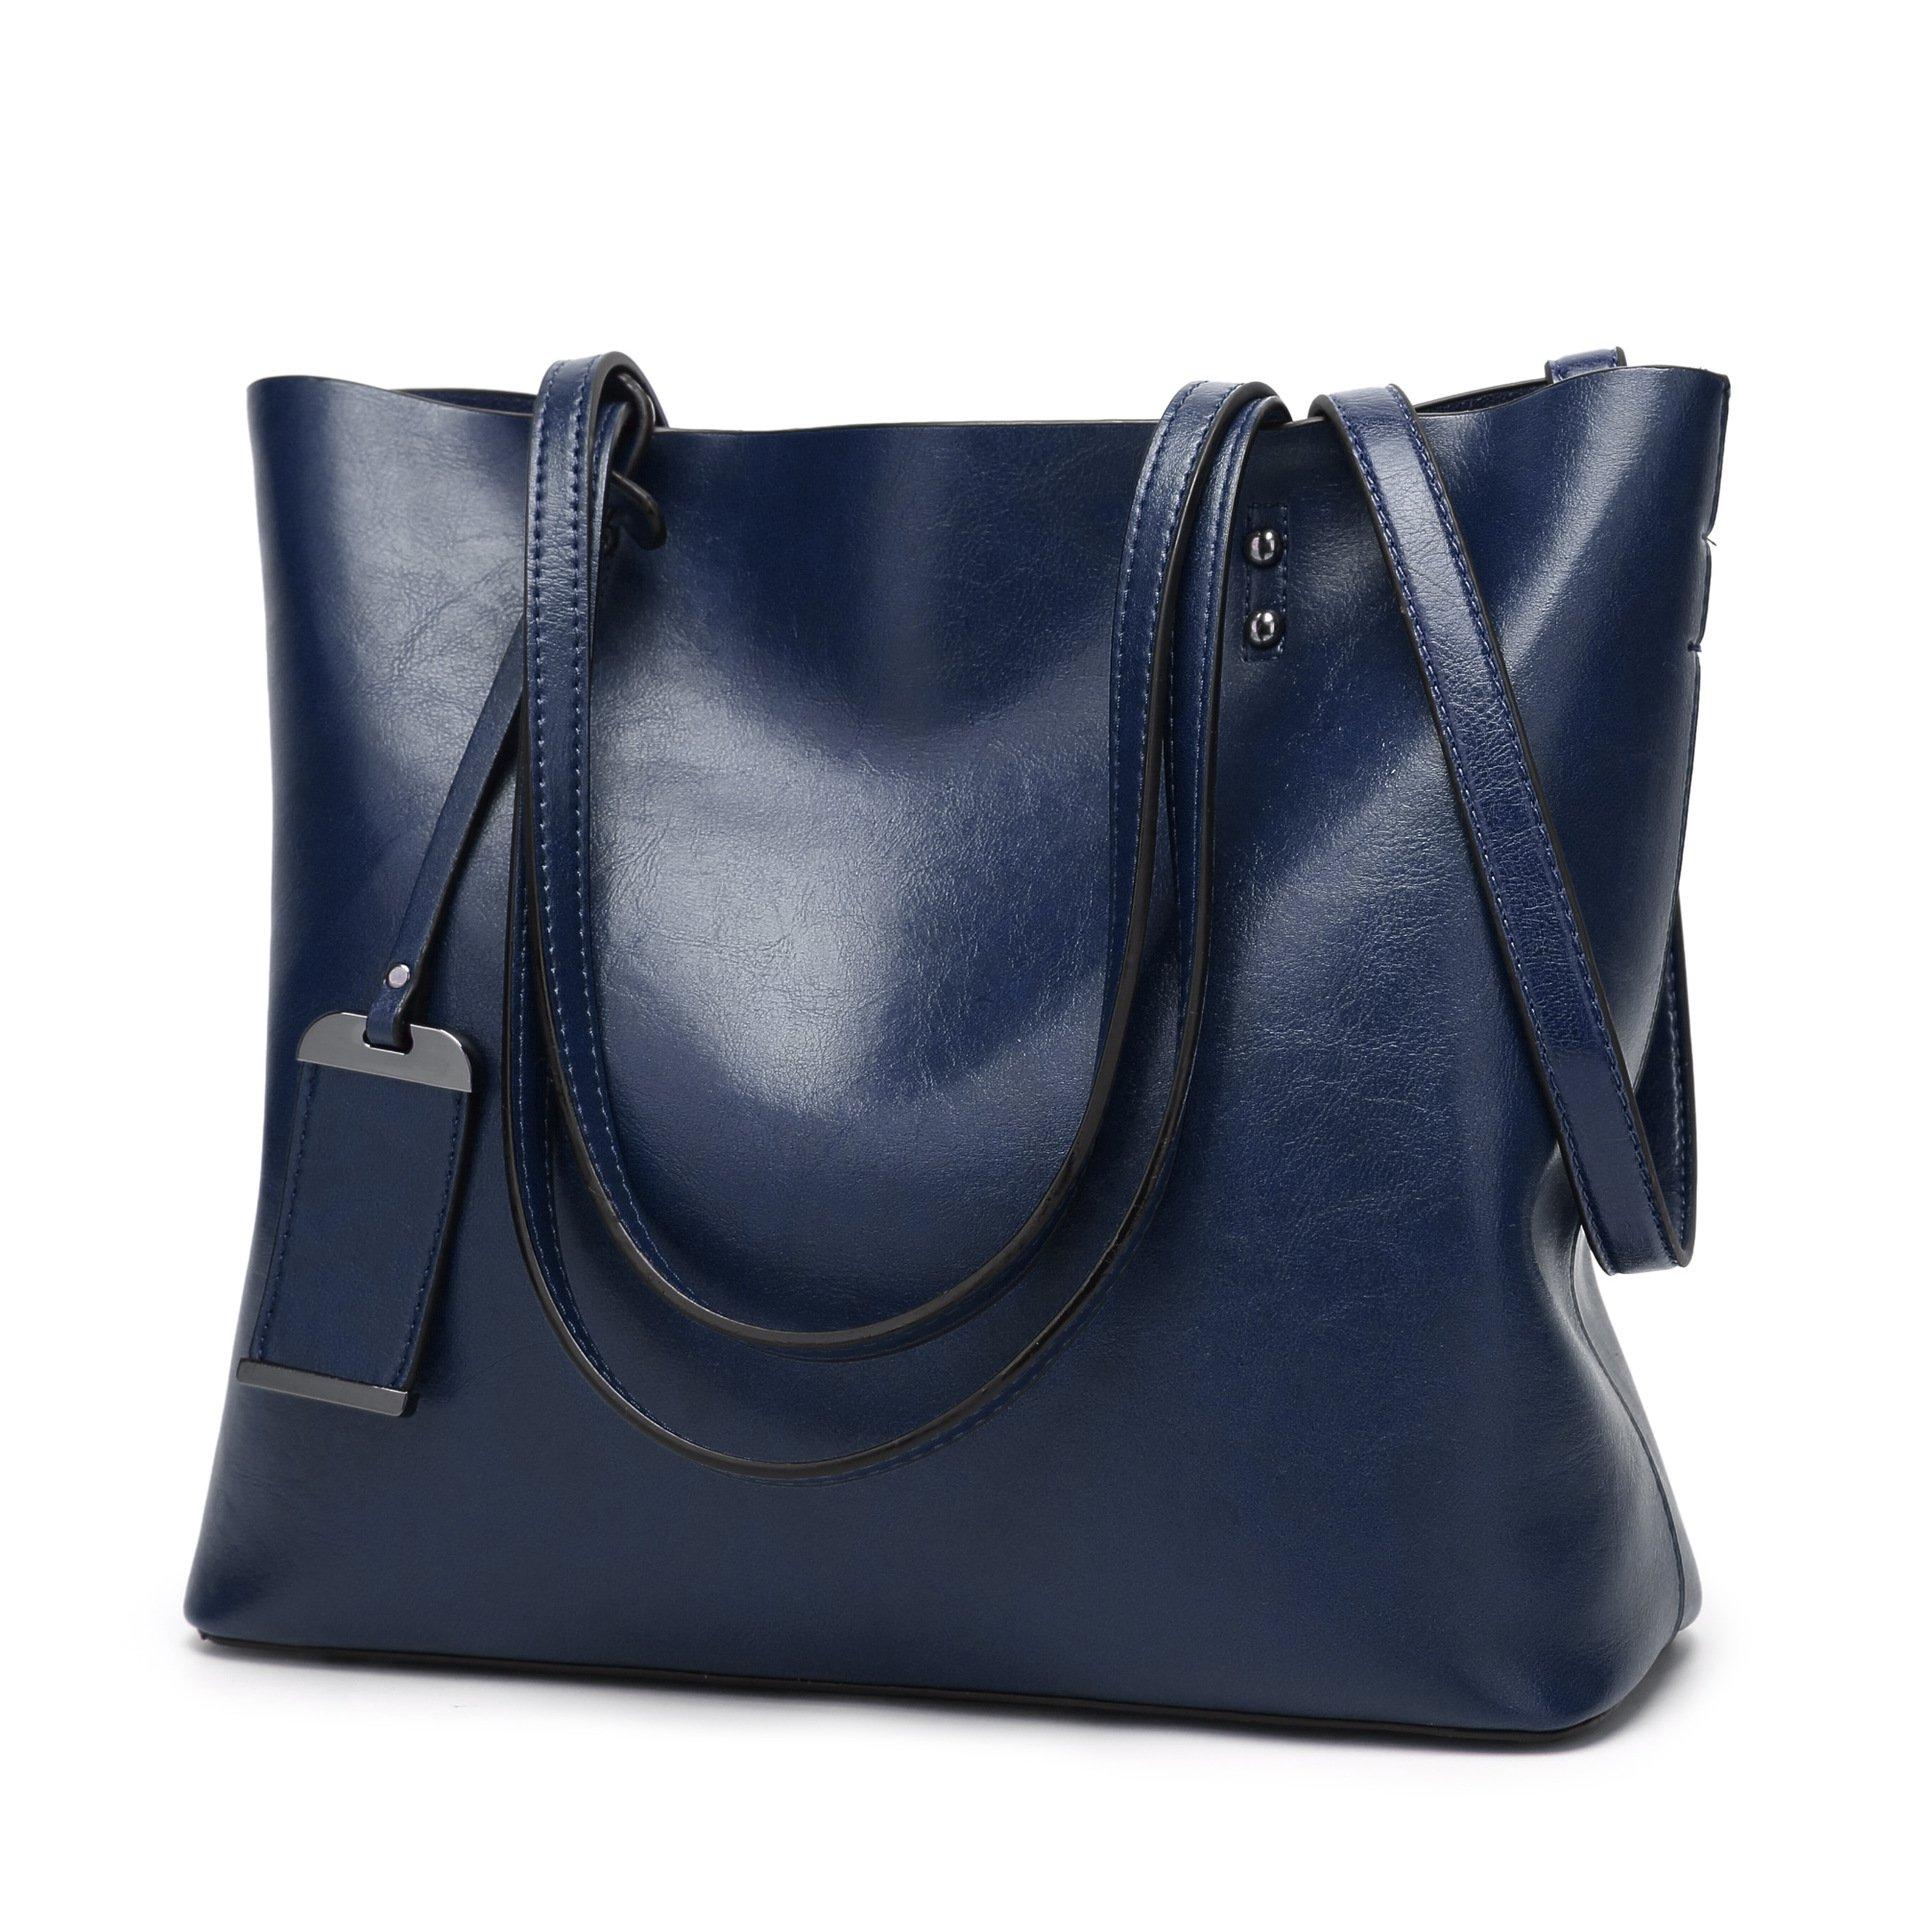 CIR Women's Vintage Fine Fibre Genuine Leather Bag Tote Shoulder Bag Handbag Model Zoe Blue Dark